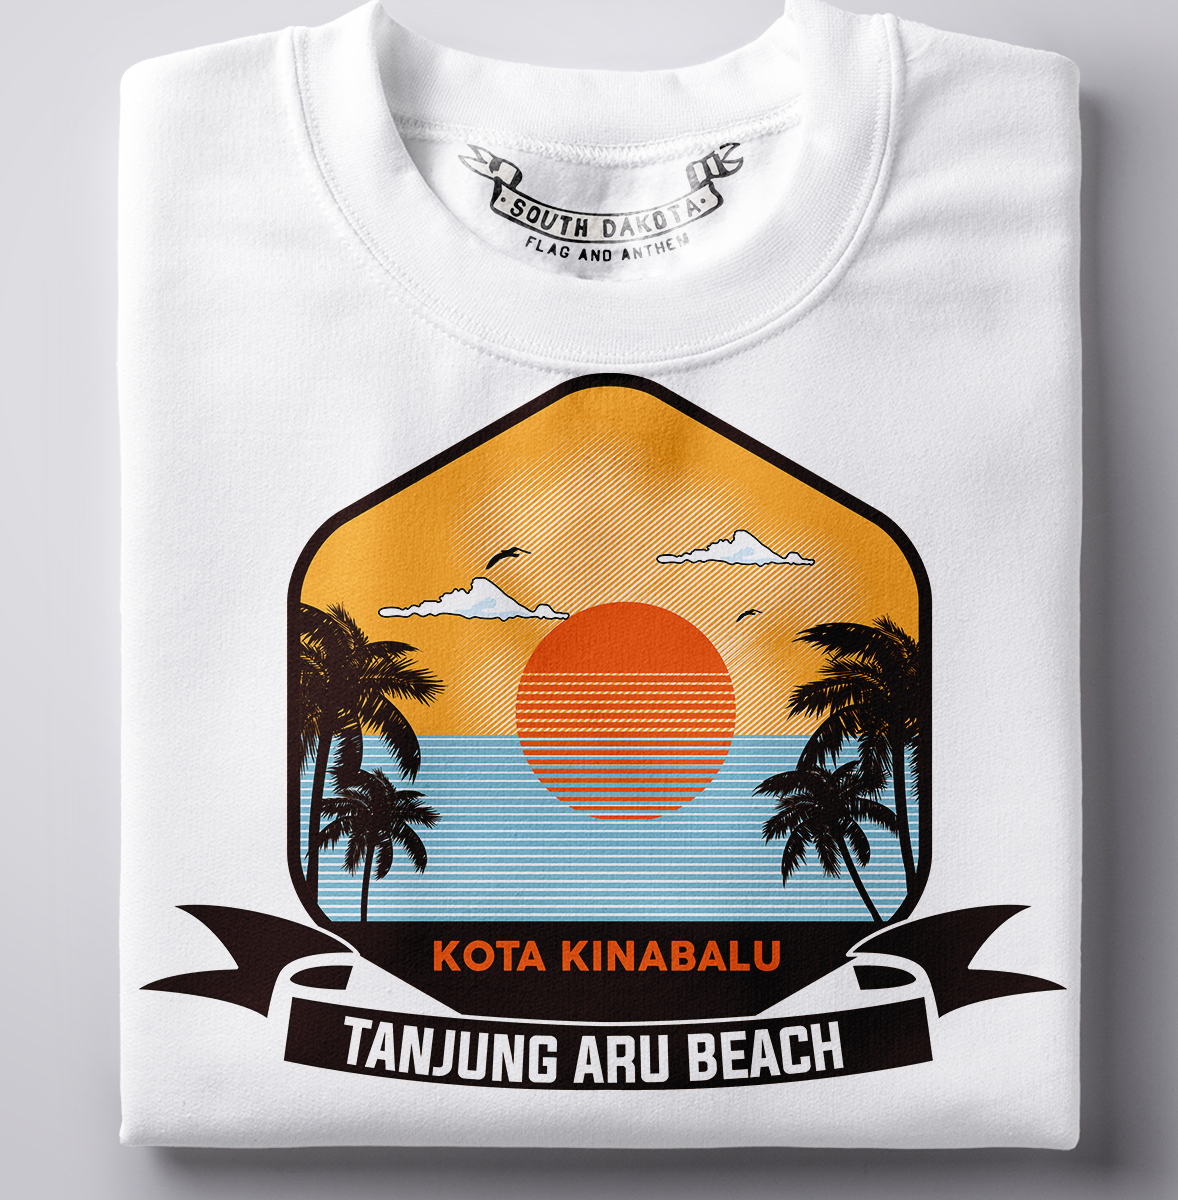 Conservative Economical Fashion T Shirt Design For Recruit Streetwear By Pranit Design 21712111